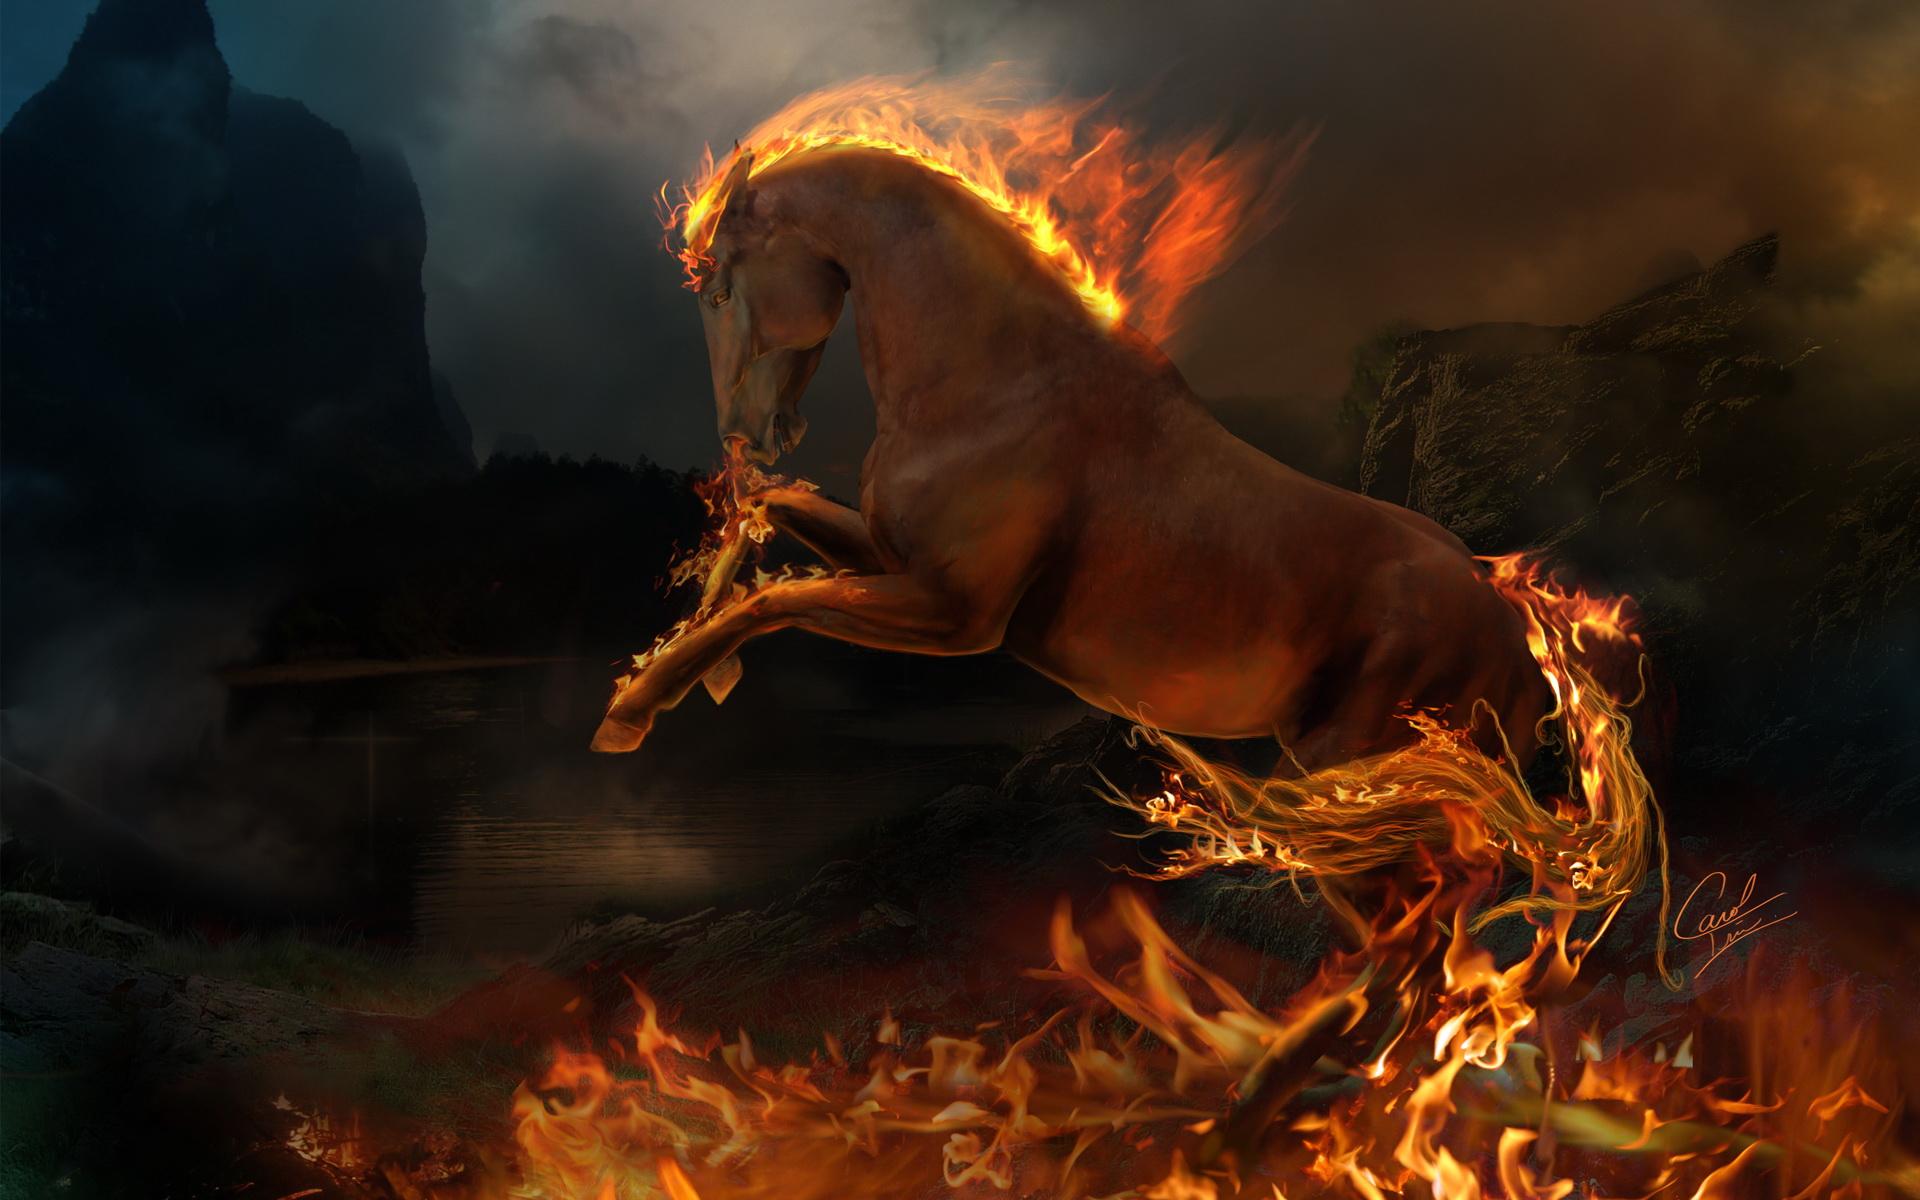 fire horse cool wallpapers desktop Desktop Backgrounds for HD 1920x1200